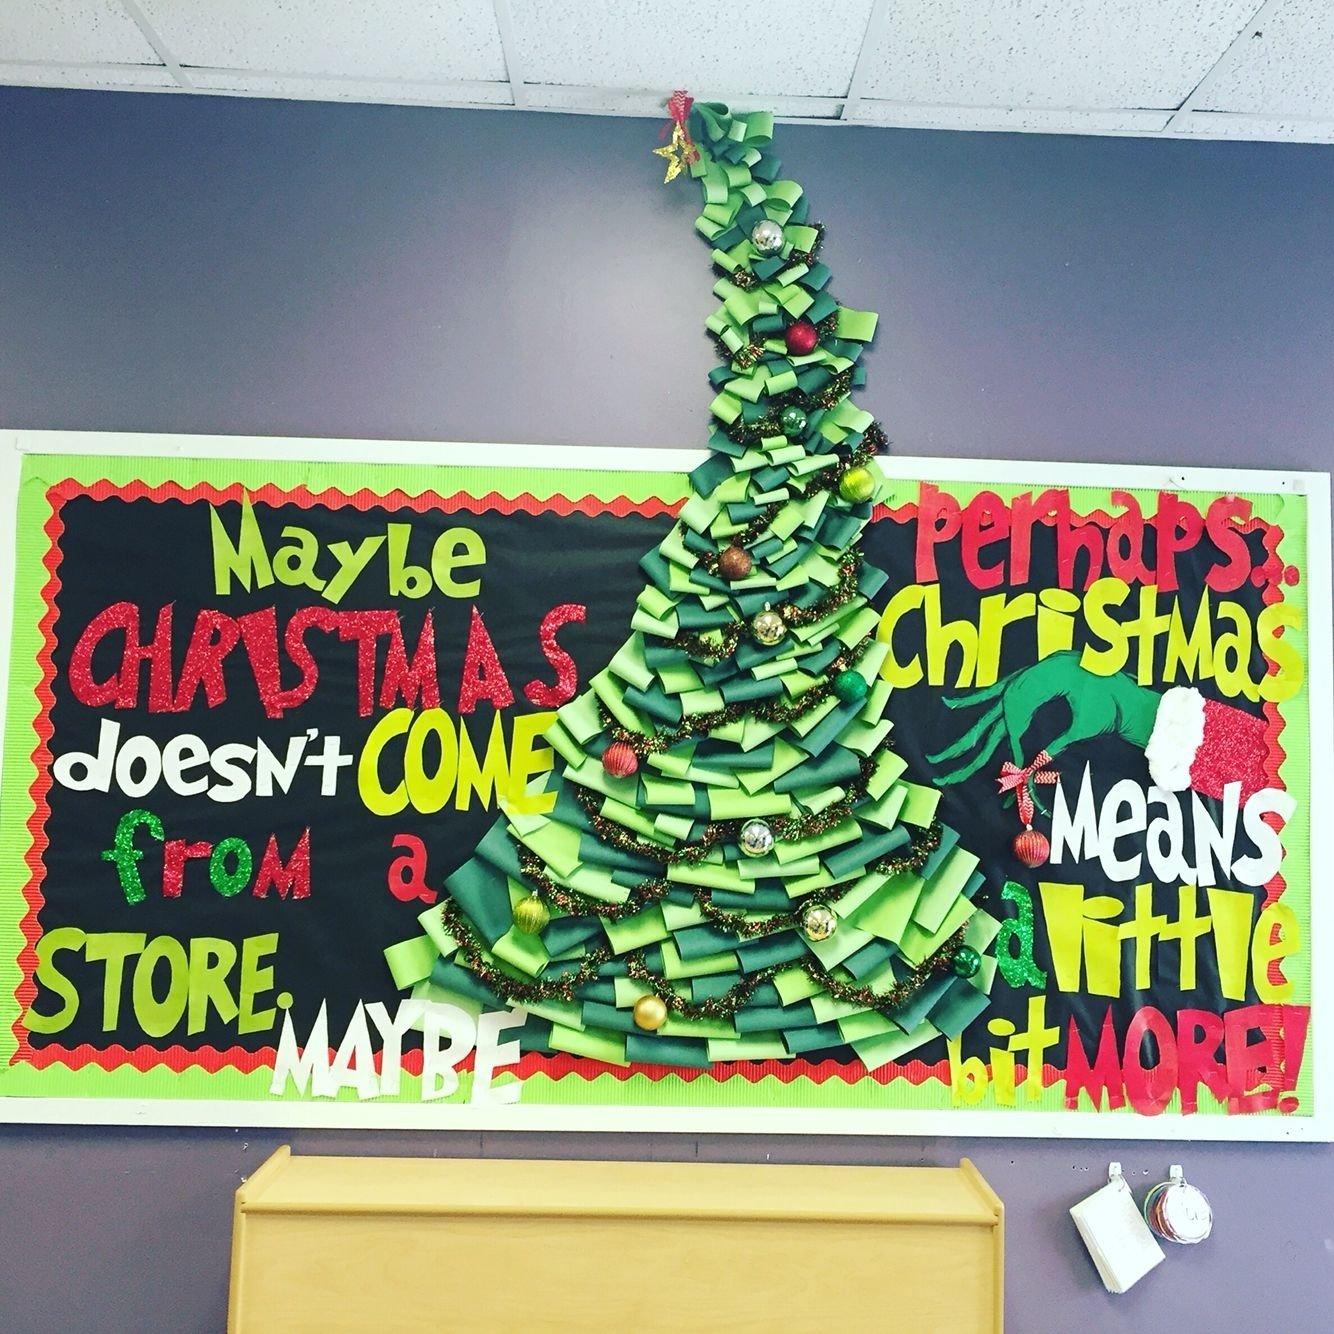 10 Attractive Christmas Tree Bulletin Board Ideas 27 diy cool cork board ideas instalation photos christmas 2021